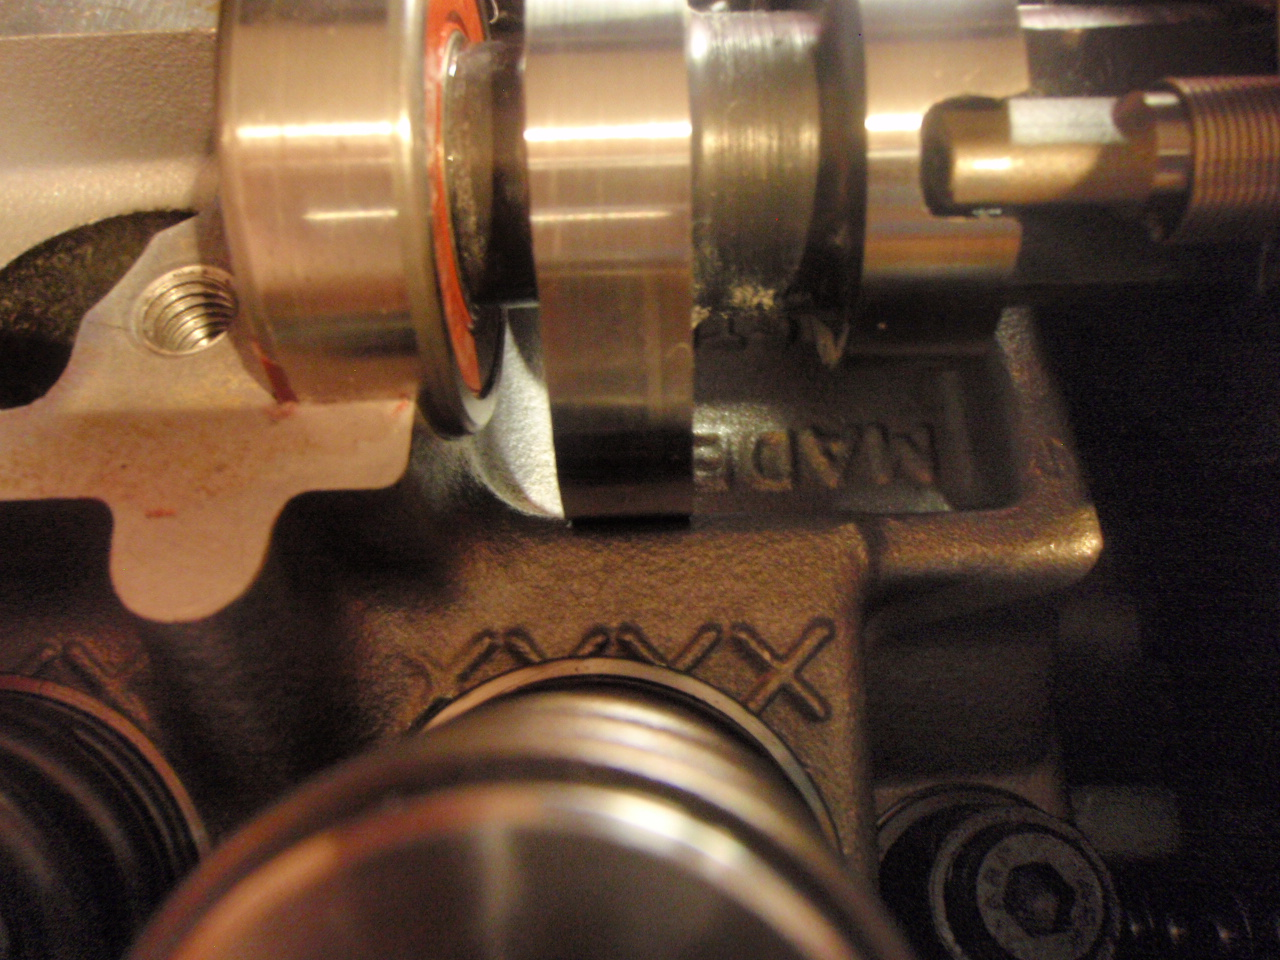 8/07 cam install - gotta grind the head for clearance-pc092070.jpg